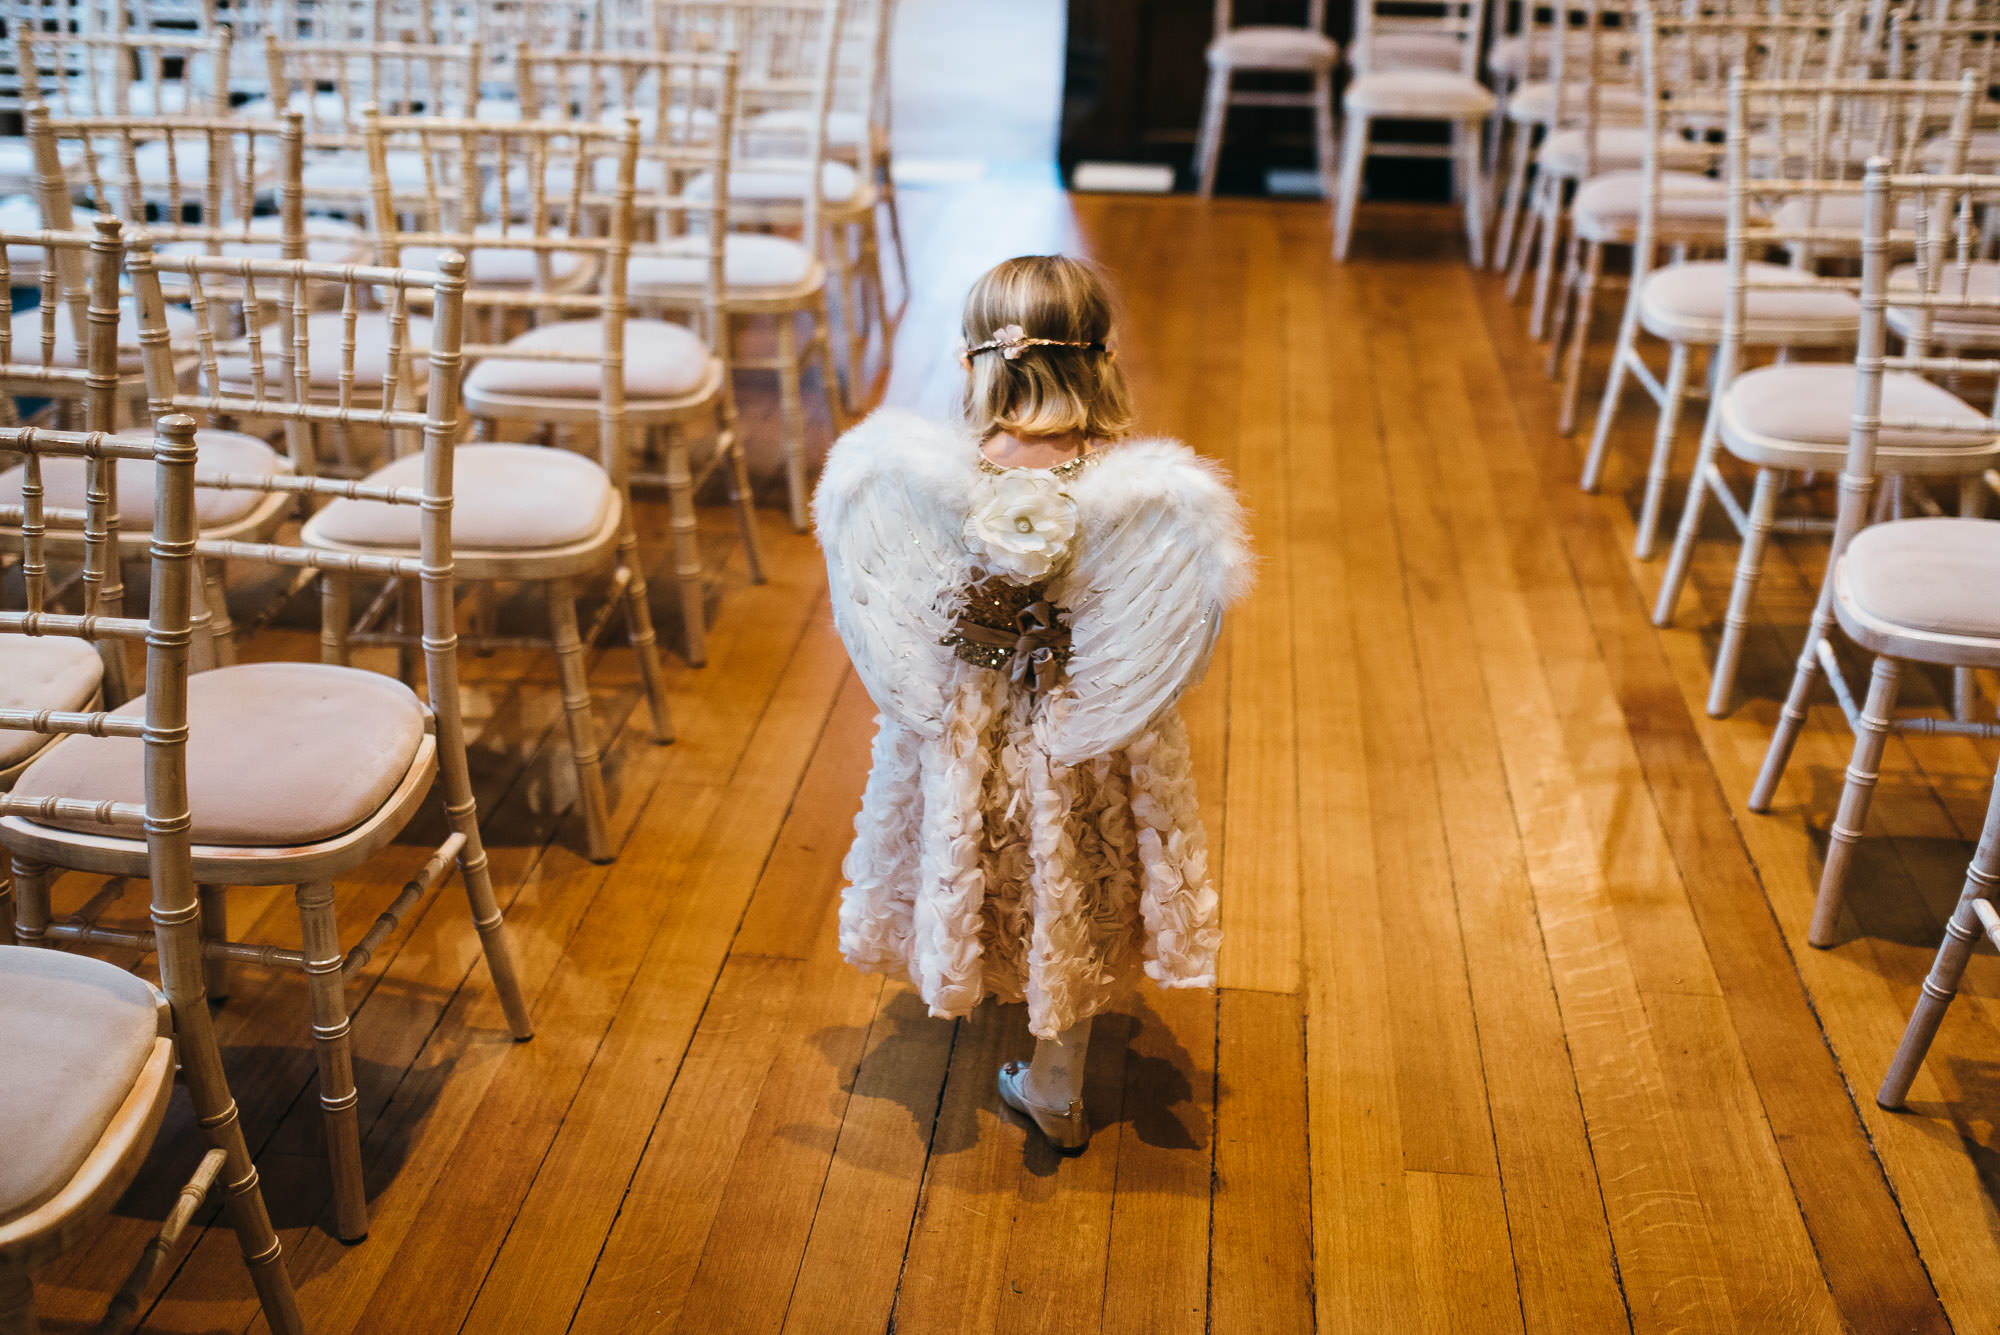 Flowergirl at Hengrave hall wedding